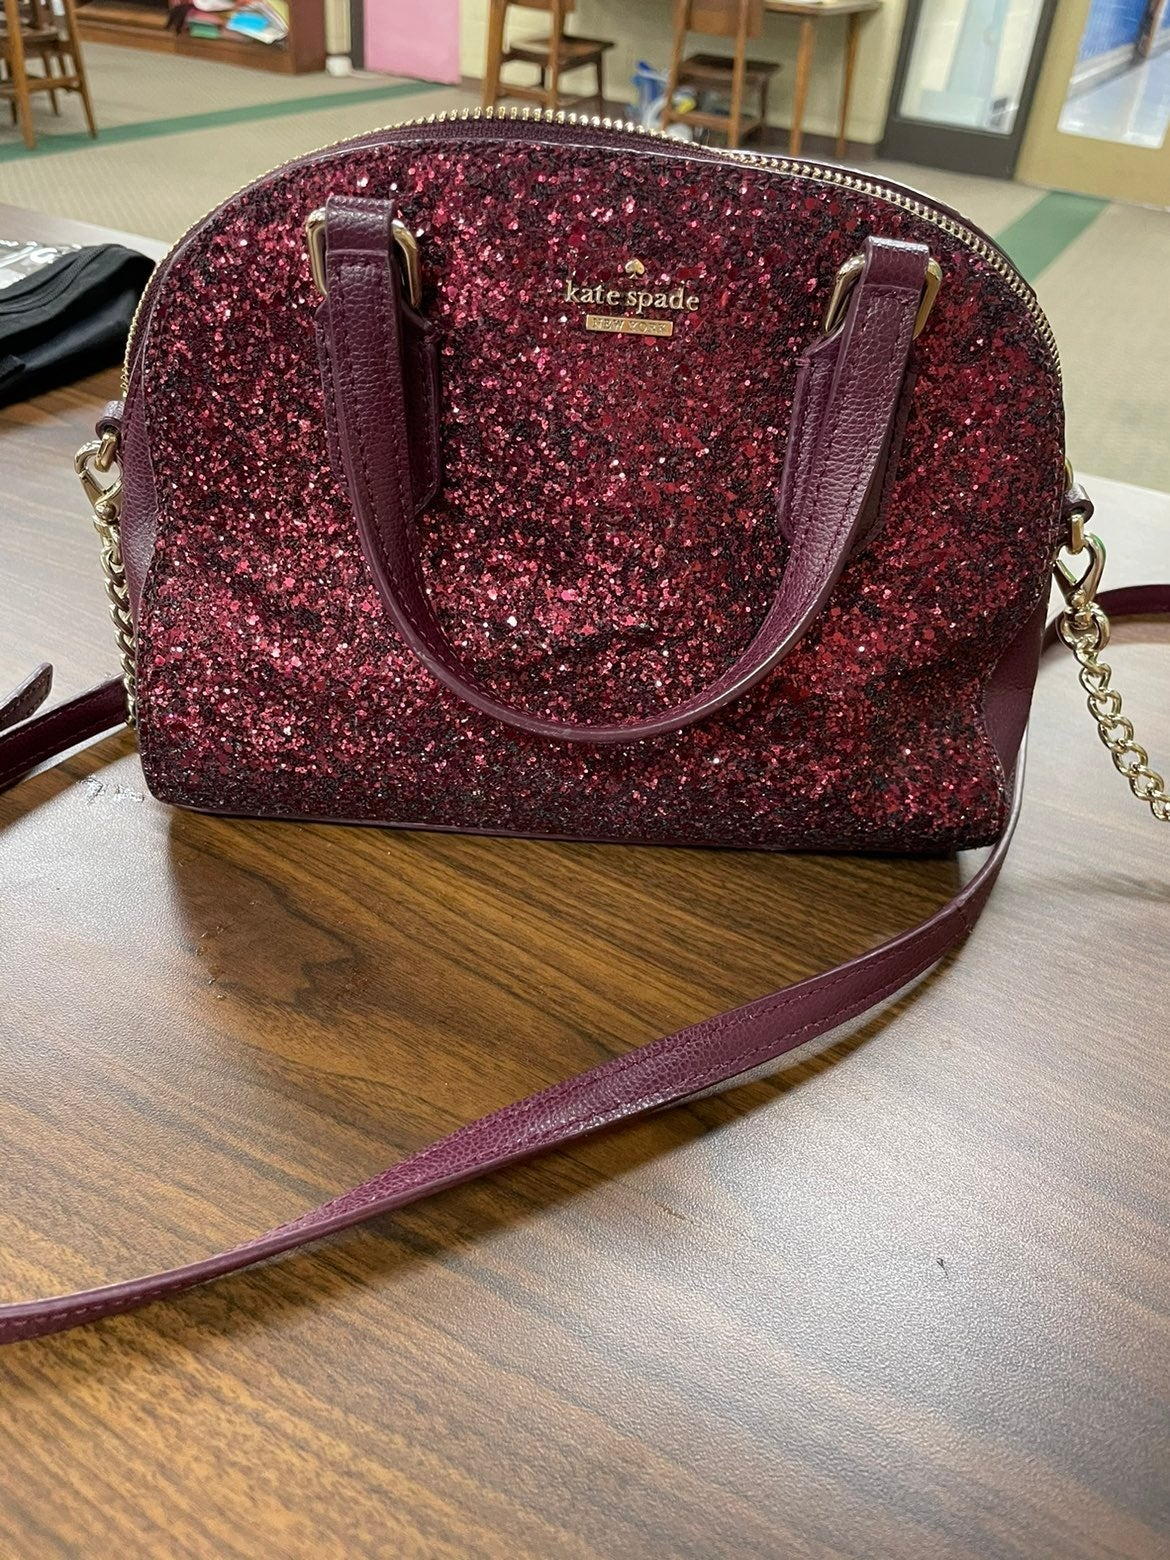 Authentic Kate Spade Plum Glitter Purse